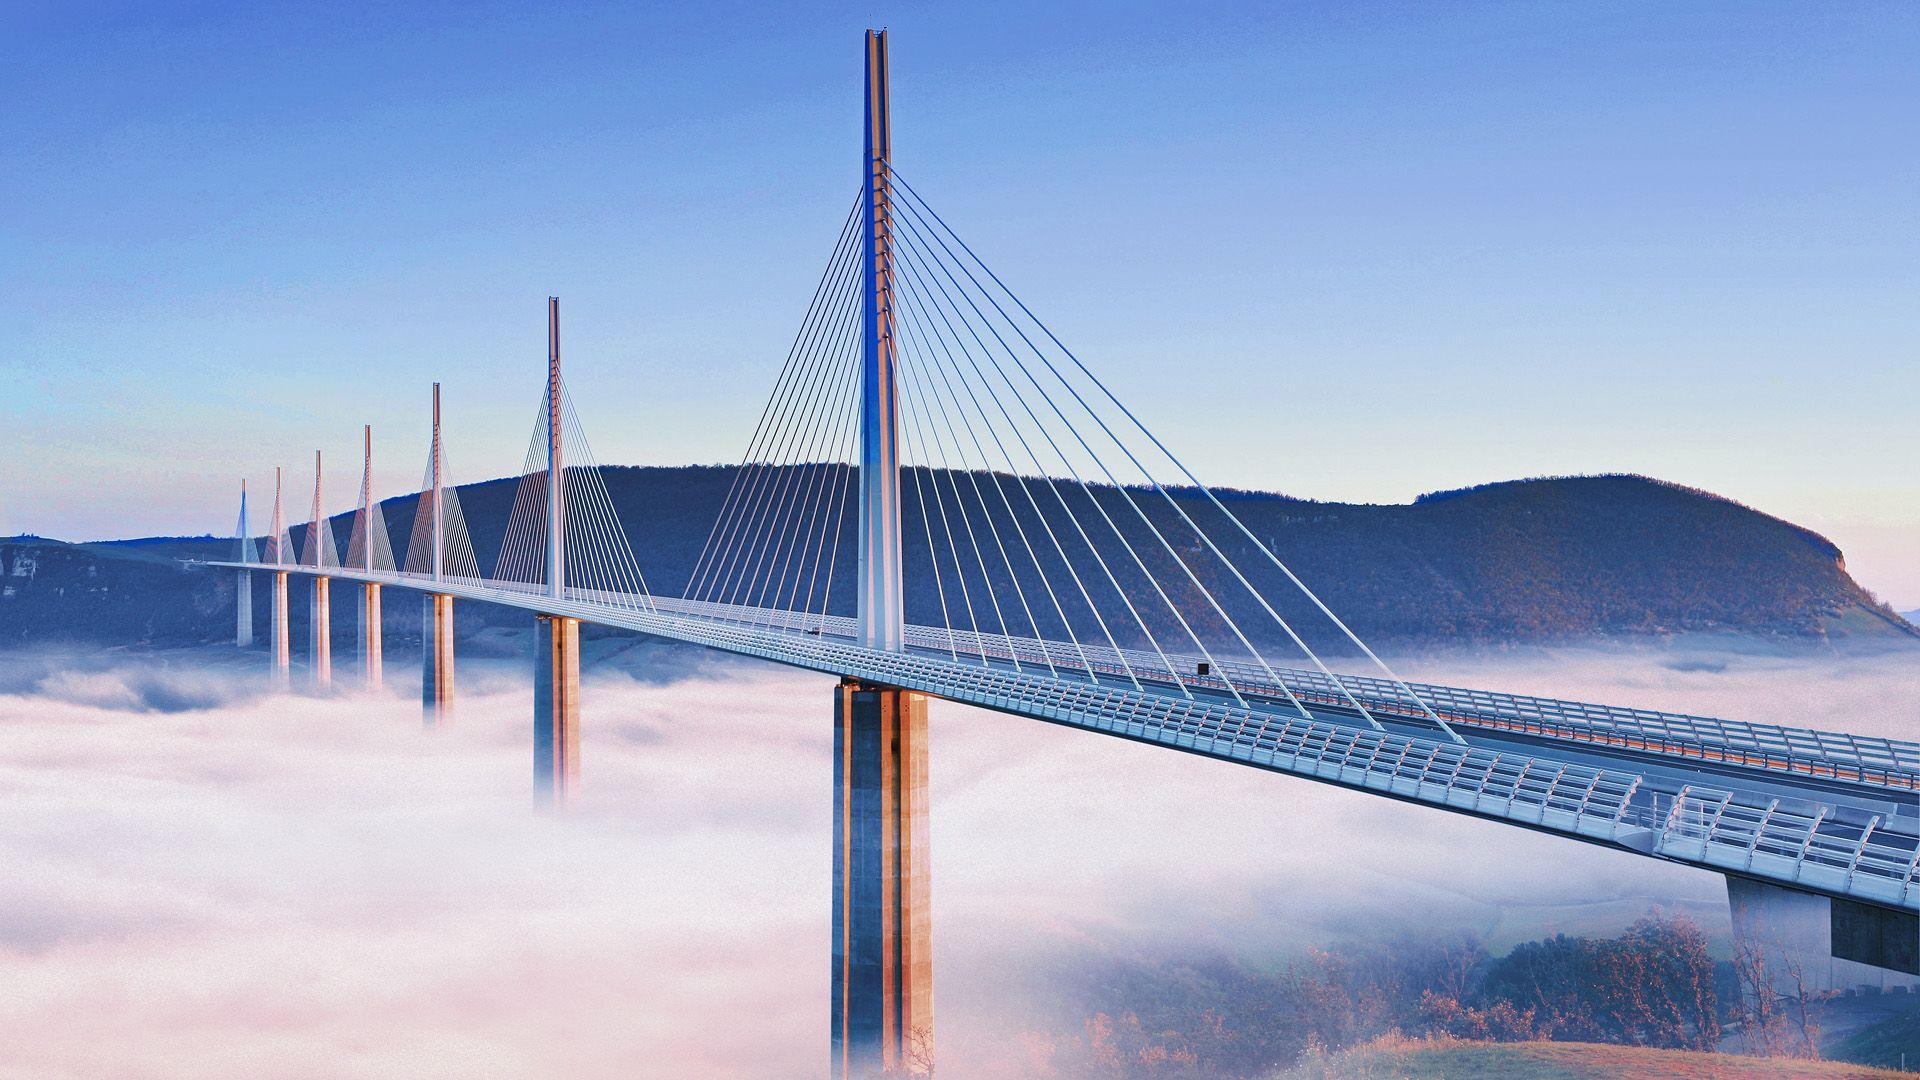 10 bridges that belong on any photographer's bucket list - corel